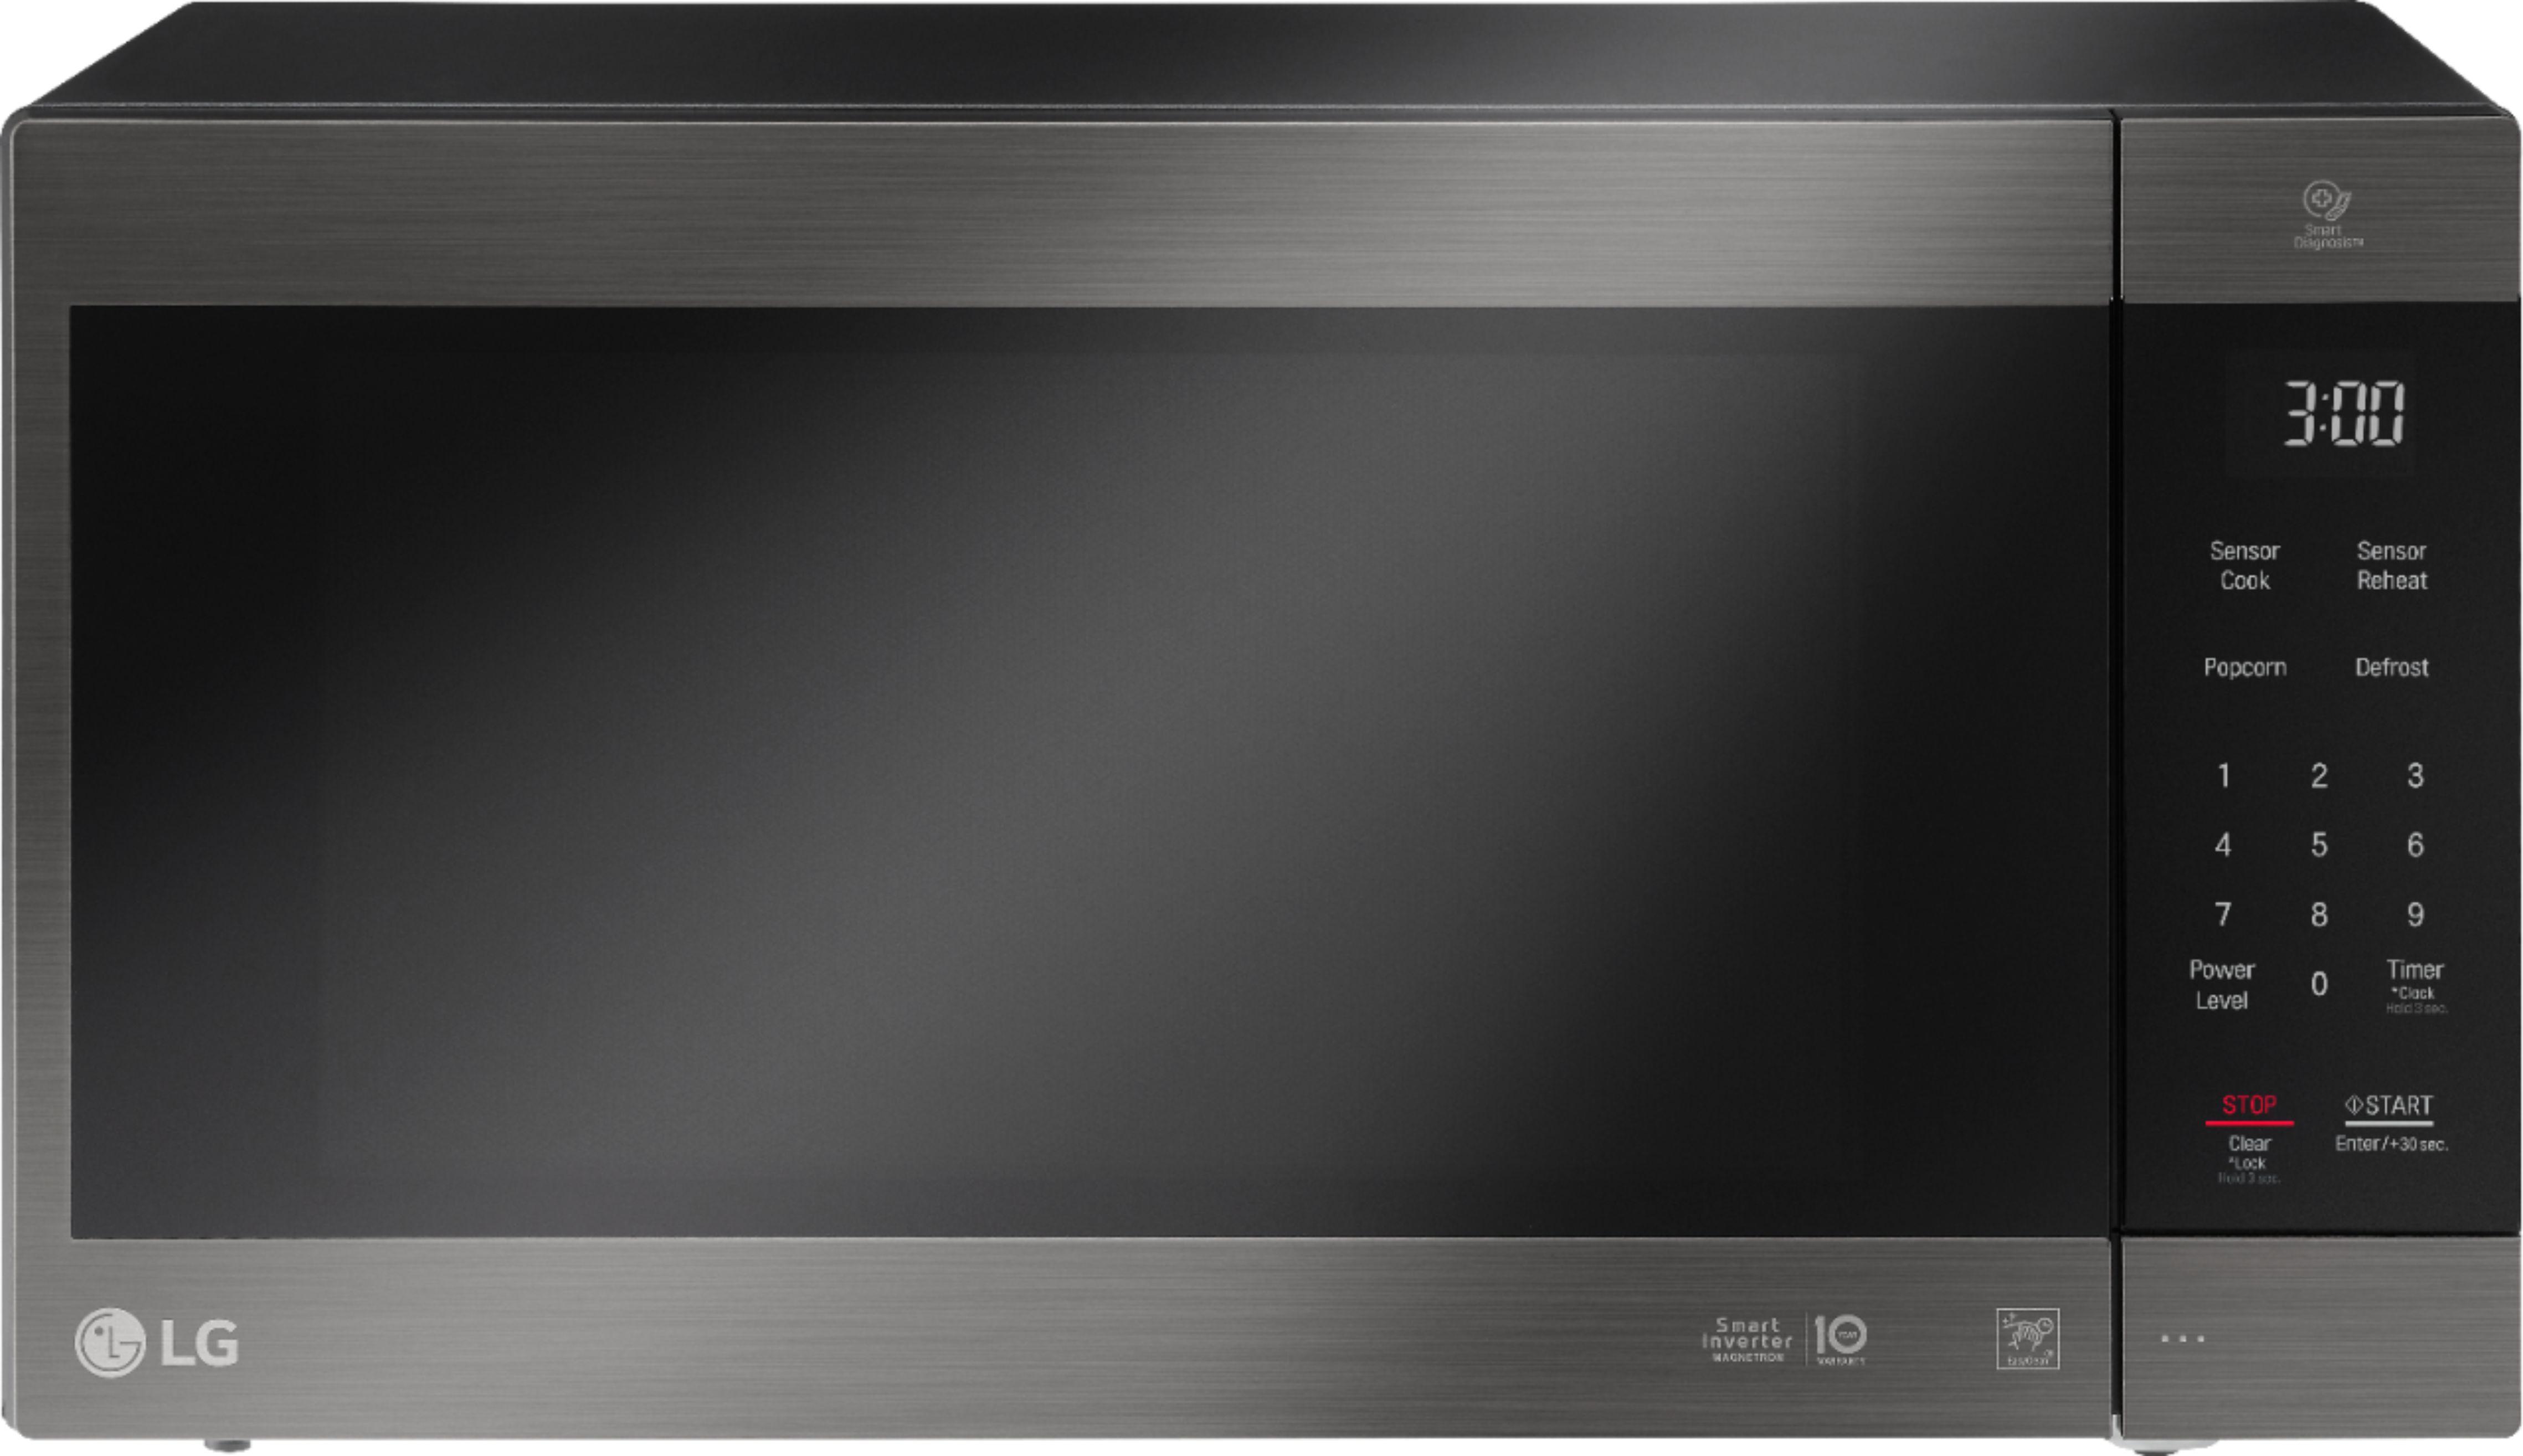 lg neochef 2 0 cu ft countertop microwave with smart inverter and easyclean printproof black stainless steel